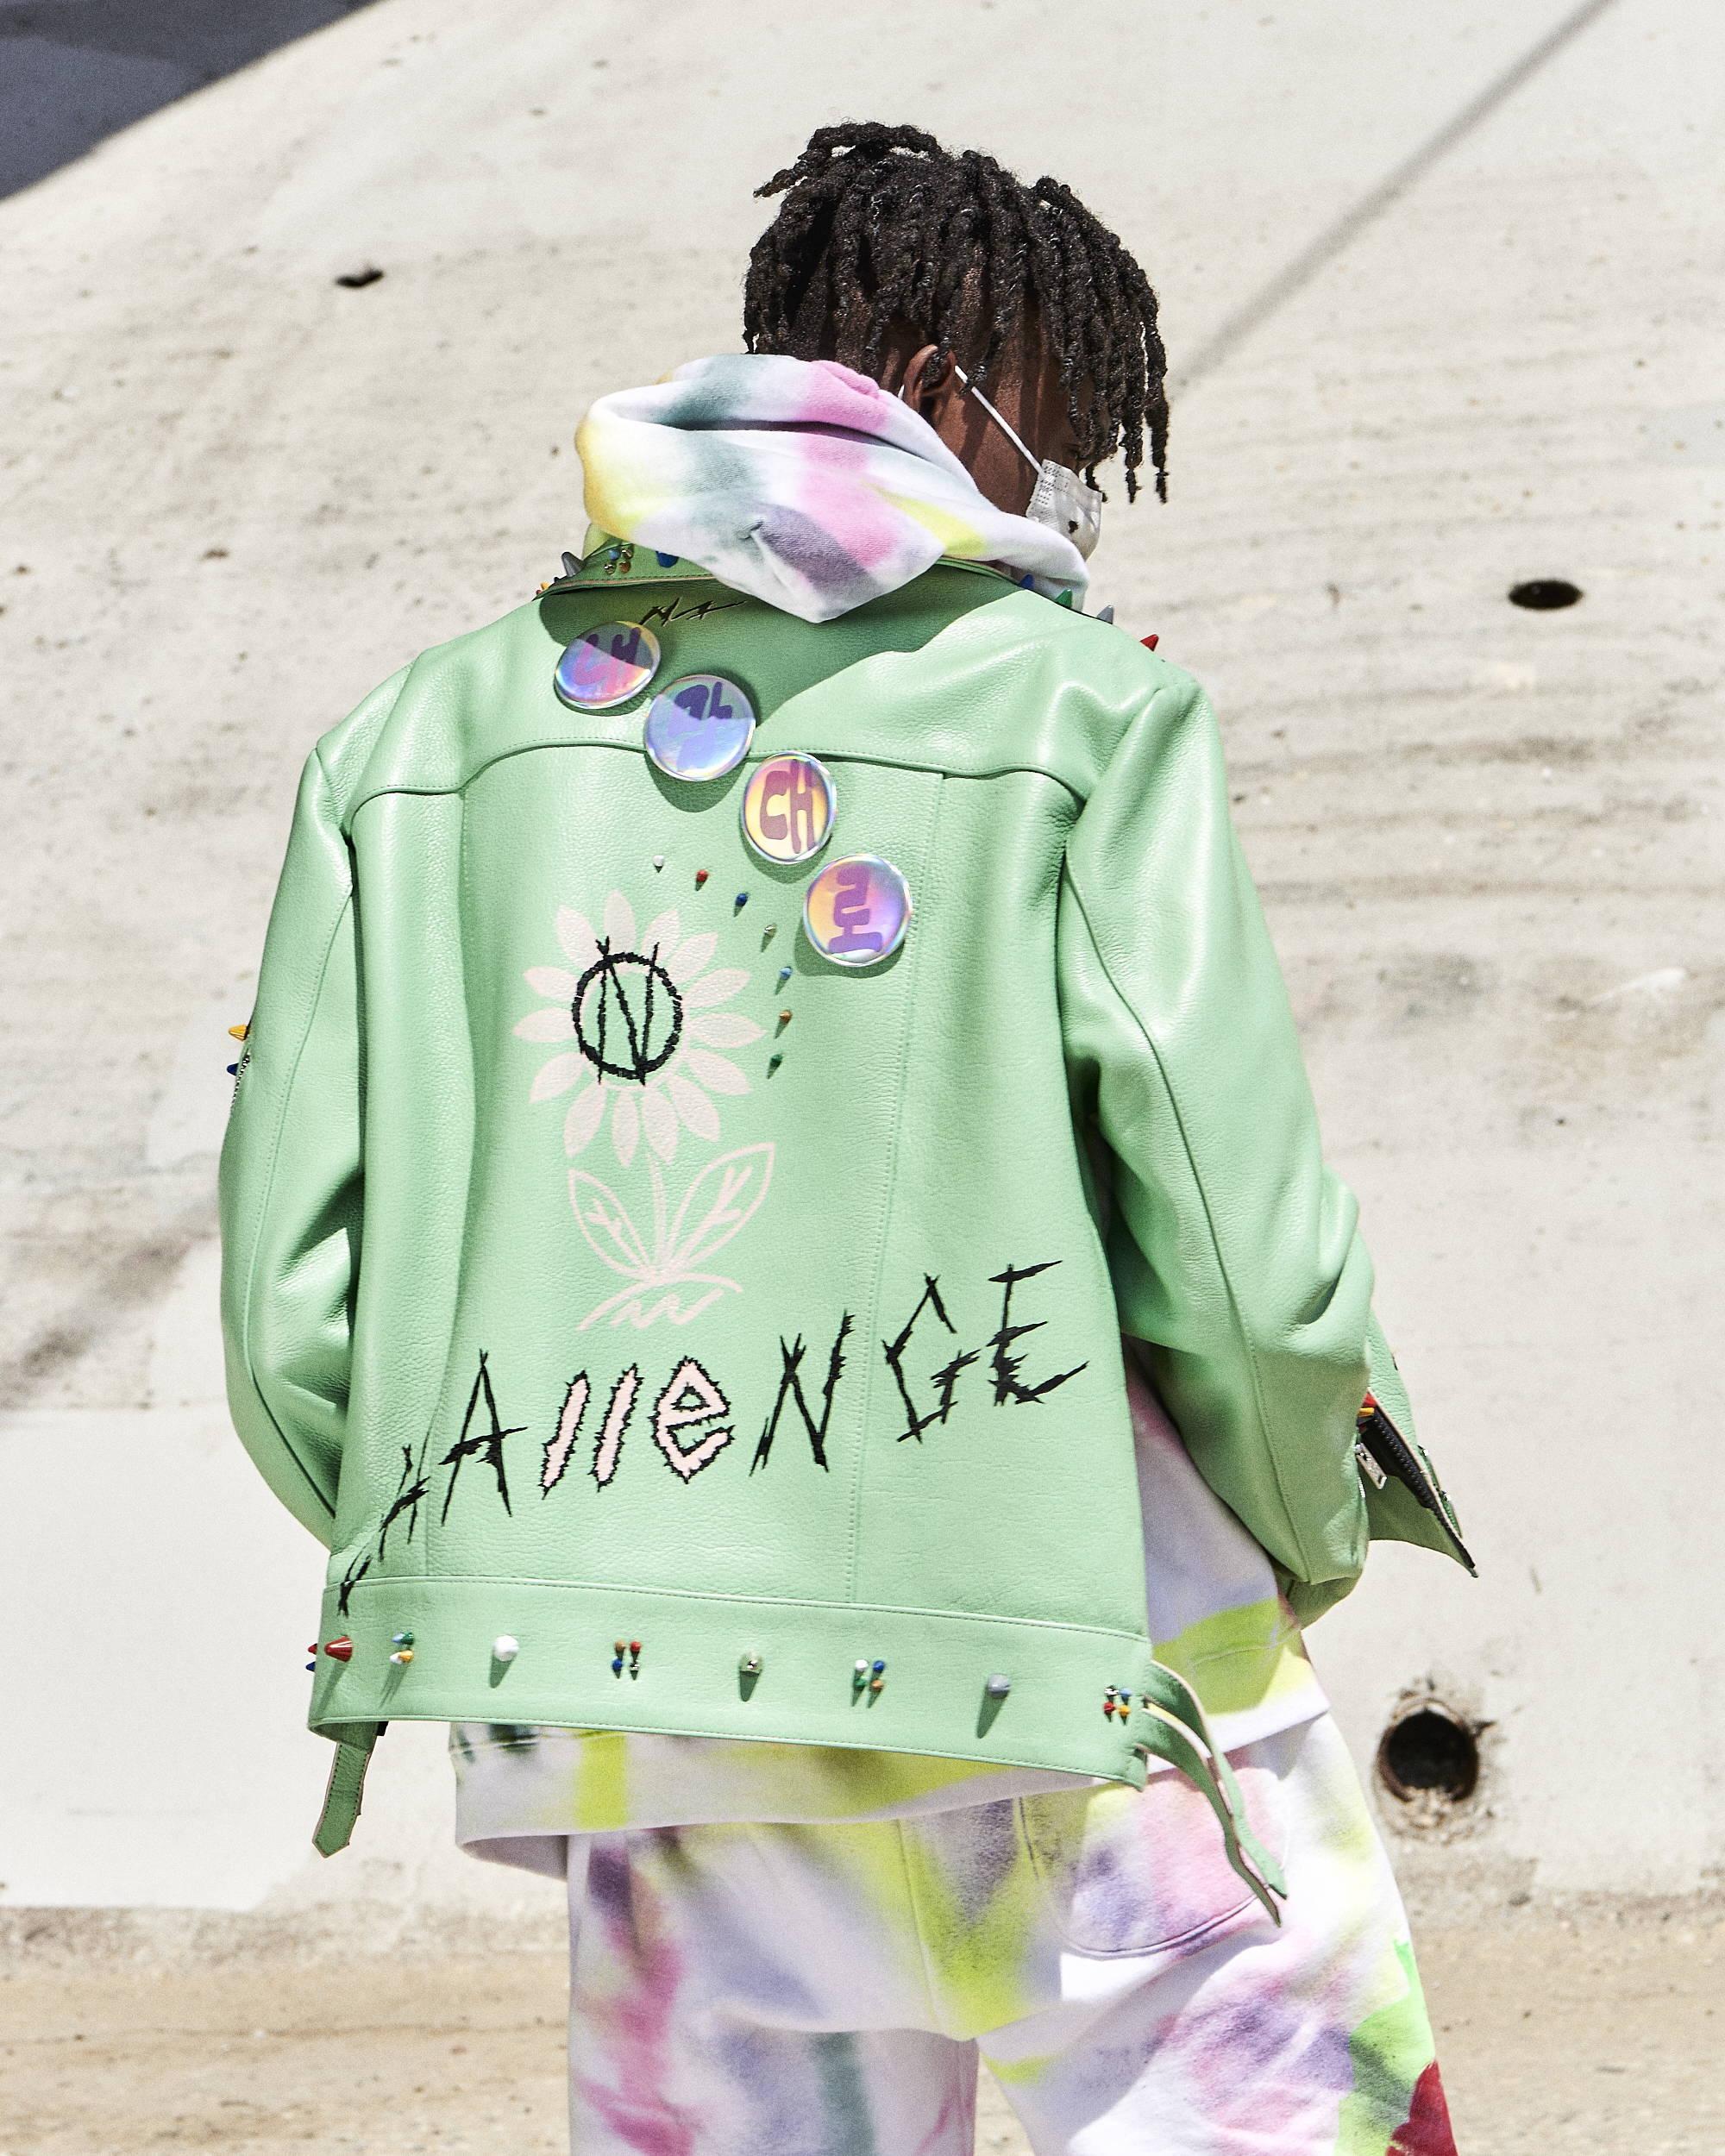 99% Exclusive Painted Leather Jacket - Hlorenzo